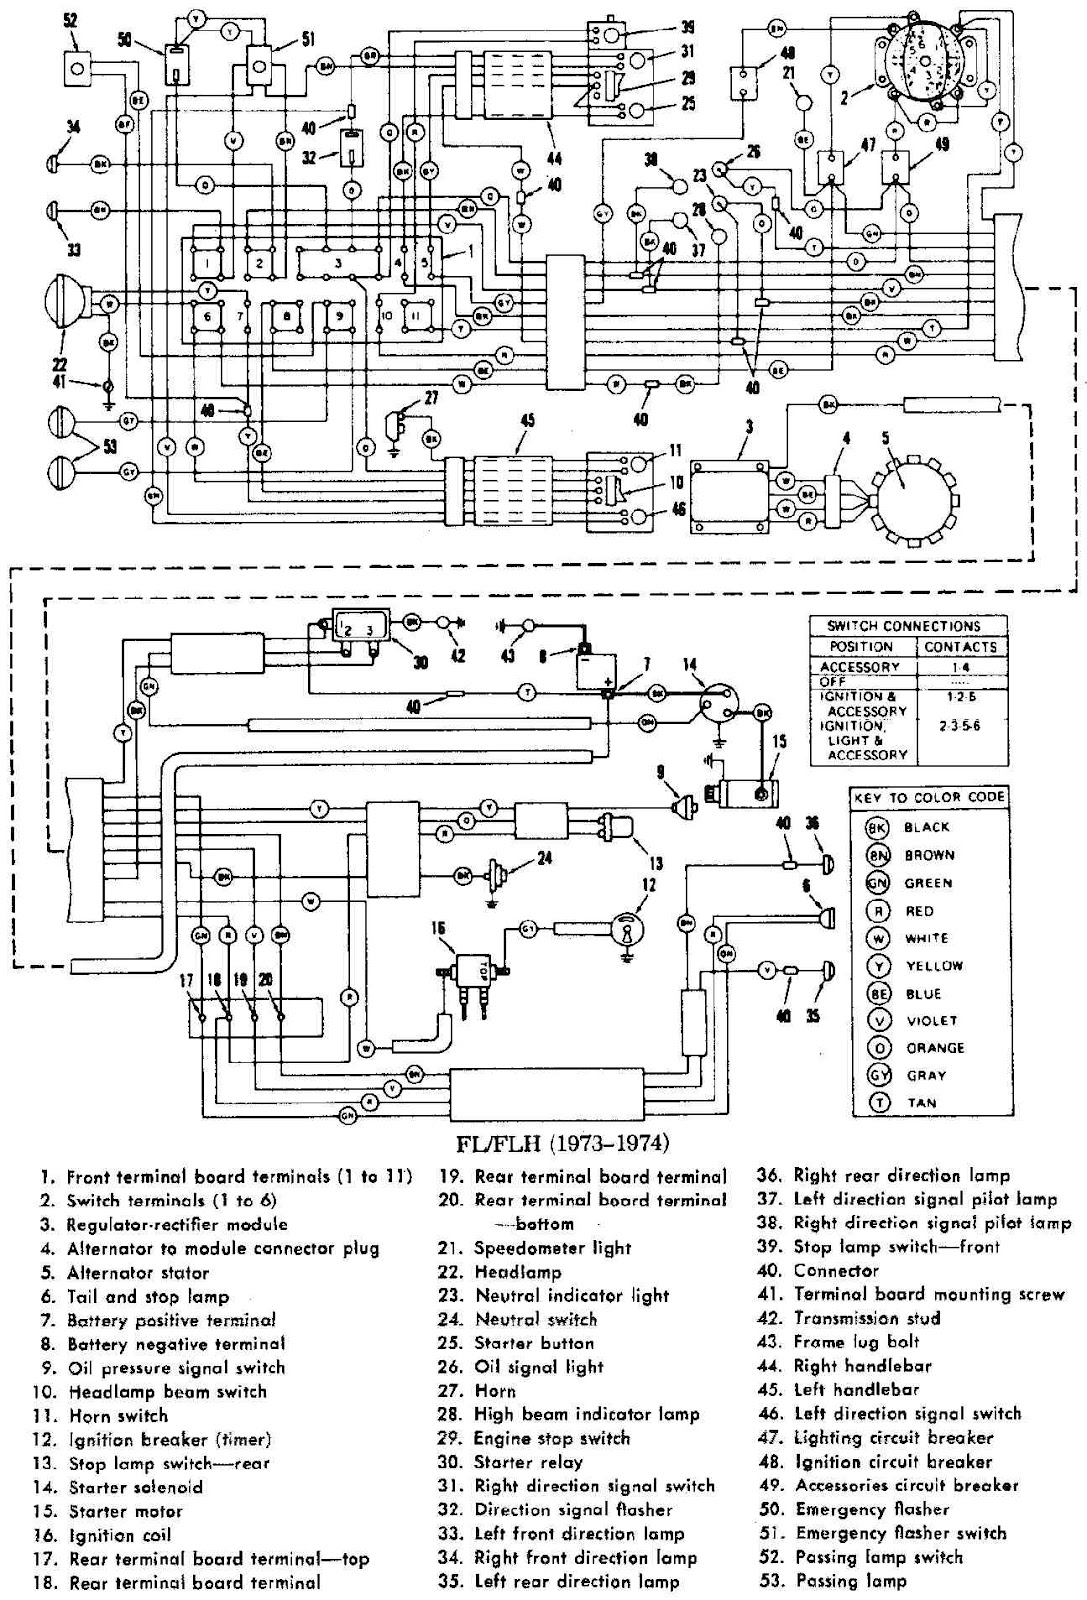 Harley Wiring Diagram on harley headlight diagram, harley fuel pump diagram, harley dash wiring, harley relay diagram, harley generator diagram, harley stator diagram, harley wiring tools, harley frame diagram, harley throttle cable diagram, harley body diagram, harley magneto diagram, harley panhead wiring, harley fuel lines diagram, harley softail wiring harness, harley evo diagram, harley rear axle diagram, harley switch diagram, harley fuse diagram, harley wiring color codes, harley shift linkage diagram,